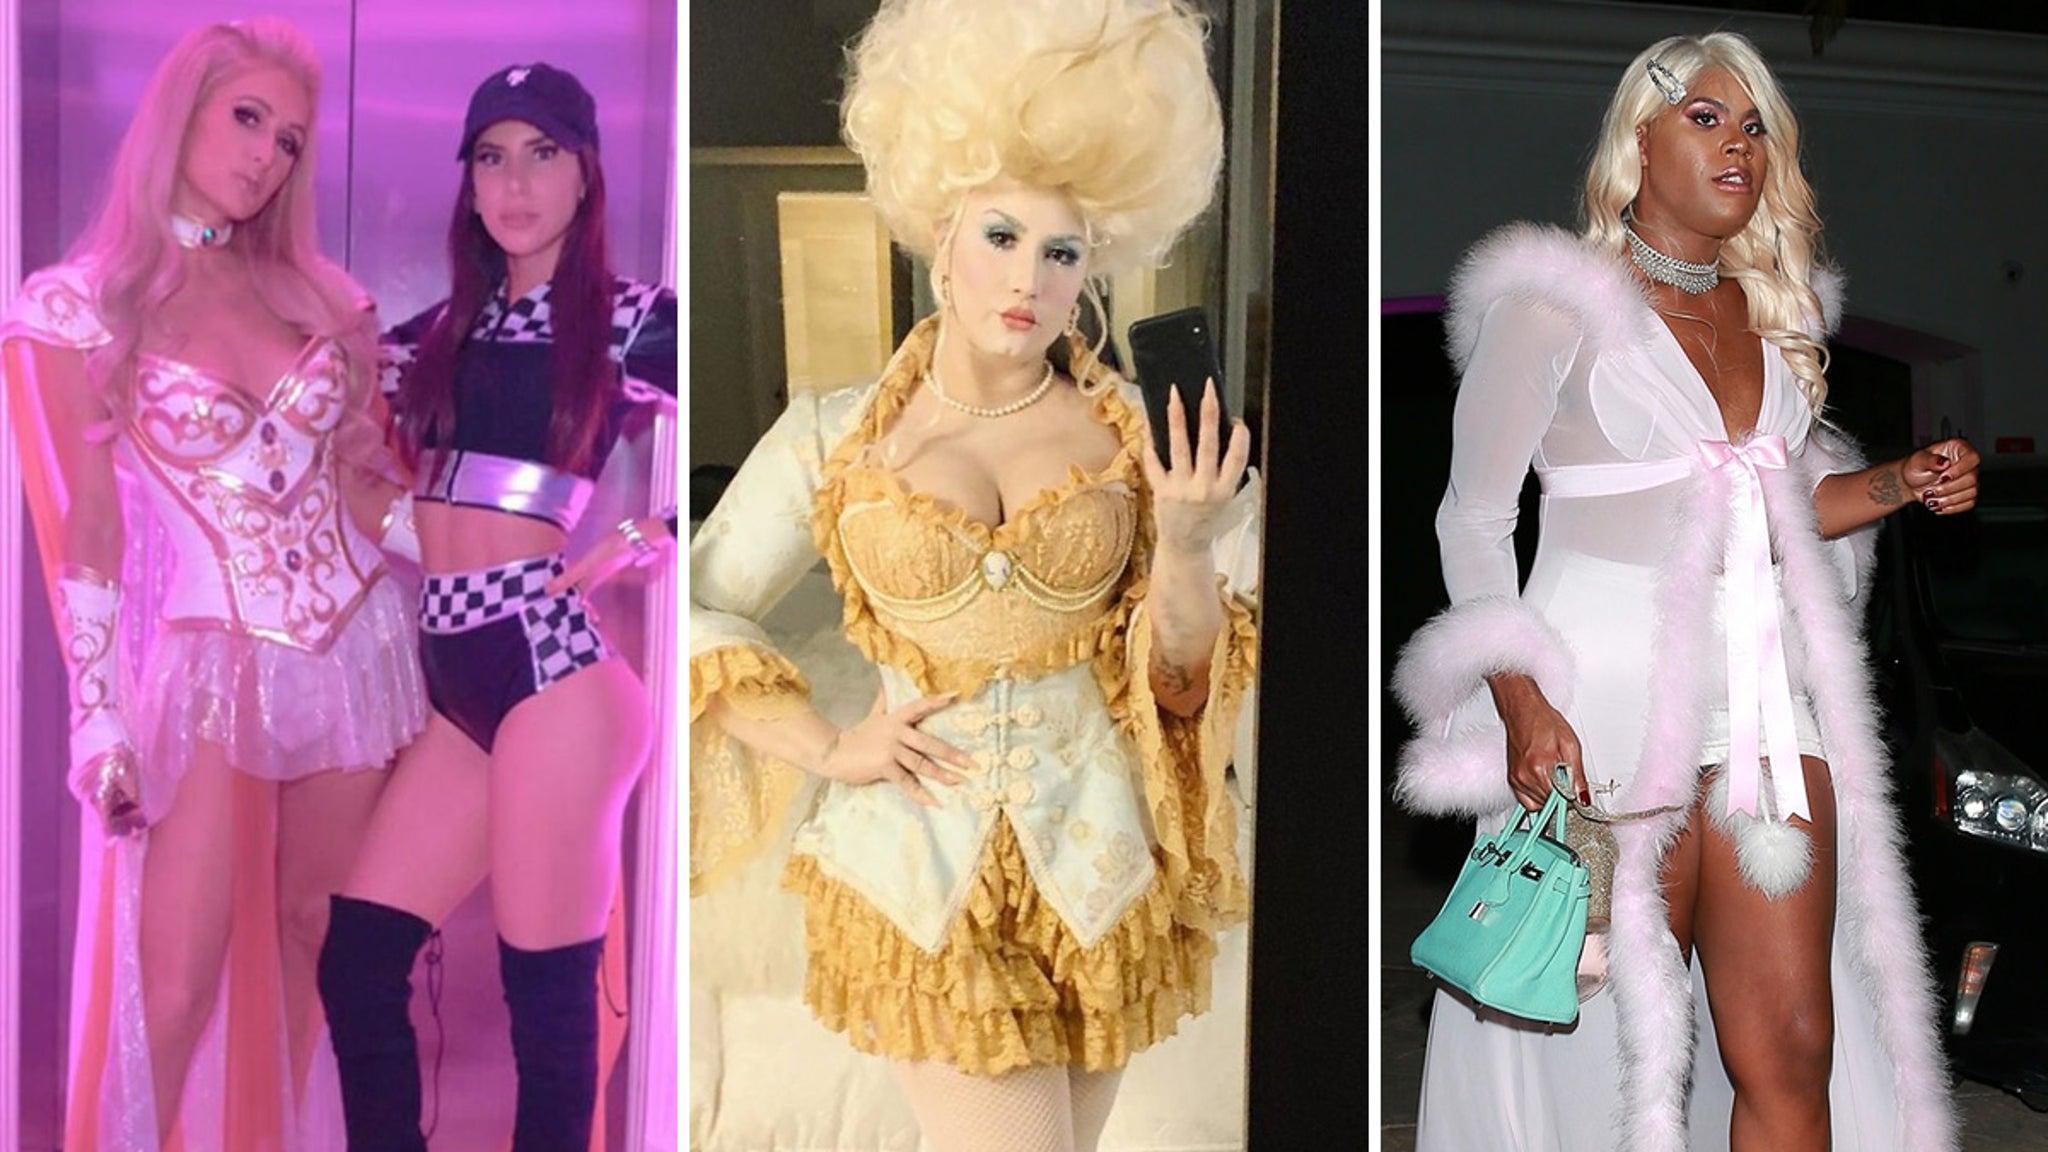 Halloween Party Chicago 2020 Hilton Hollywood Halloween Parties Kick Off with Paris Hilton Bash